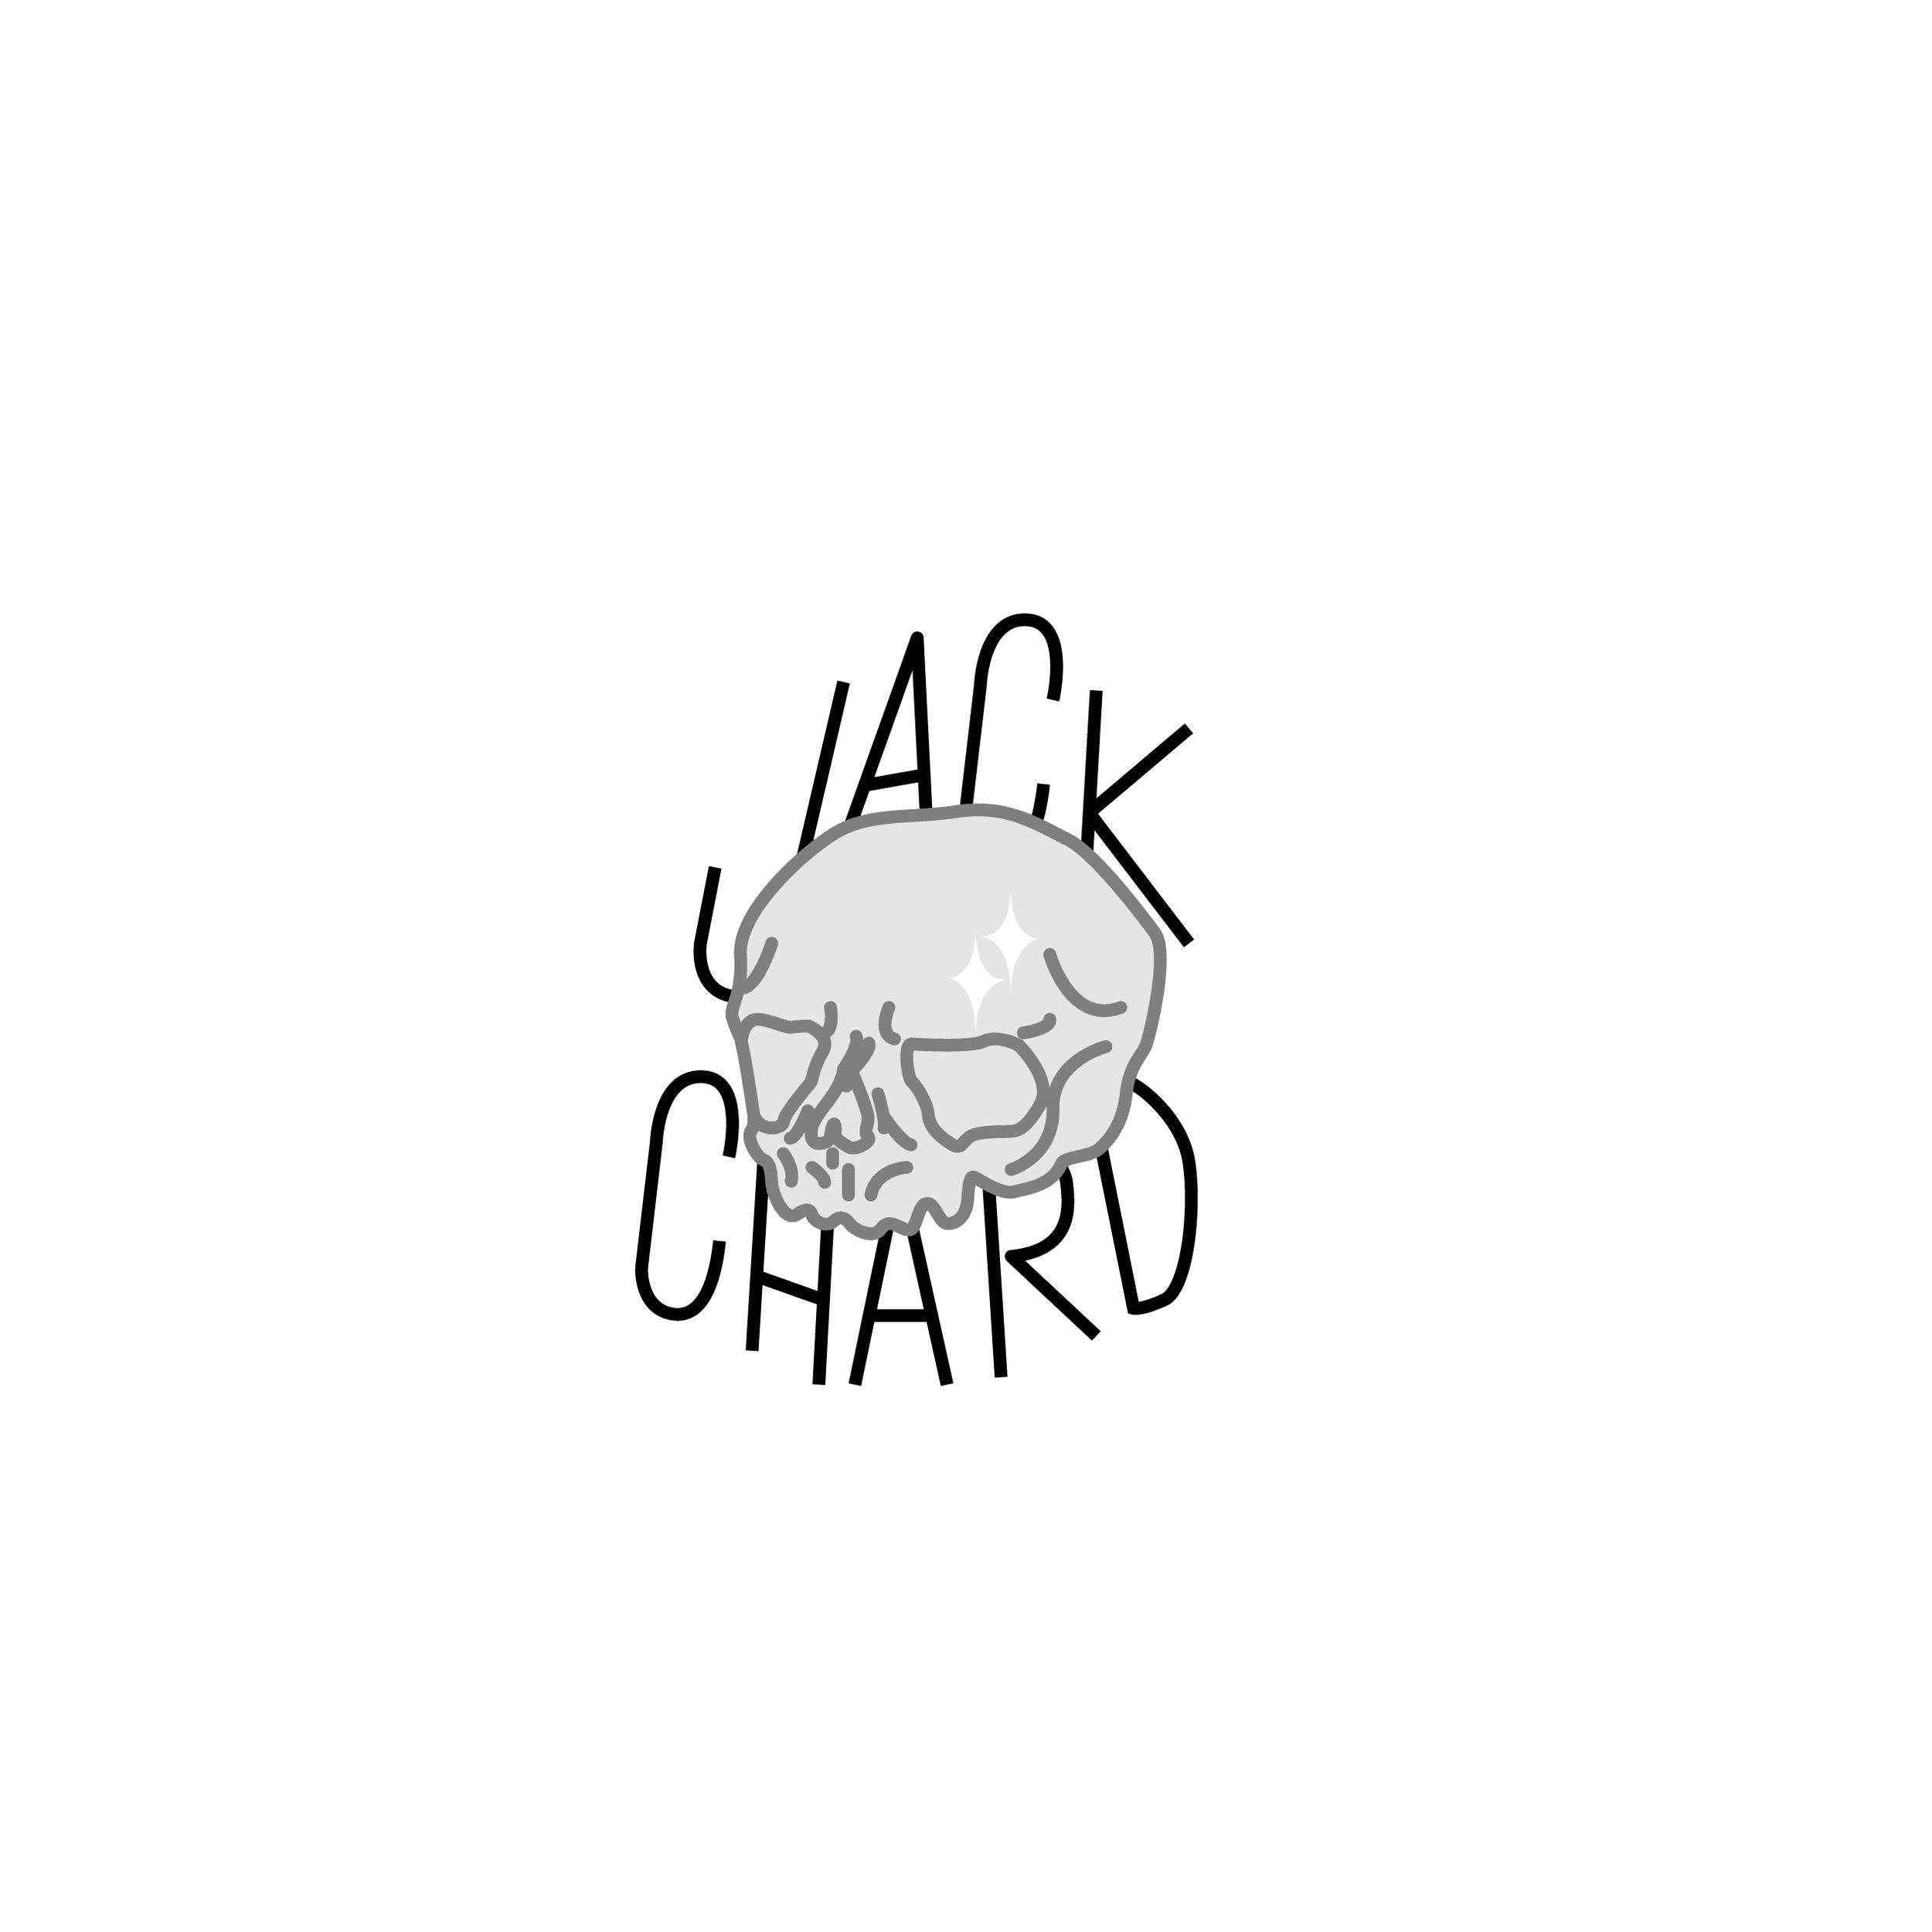 Jack chard 2.png